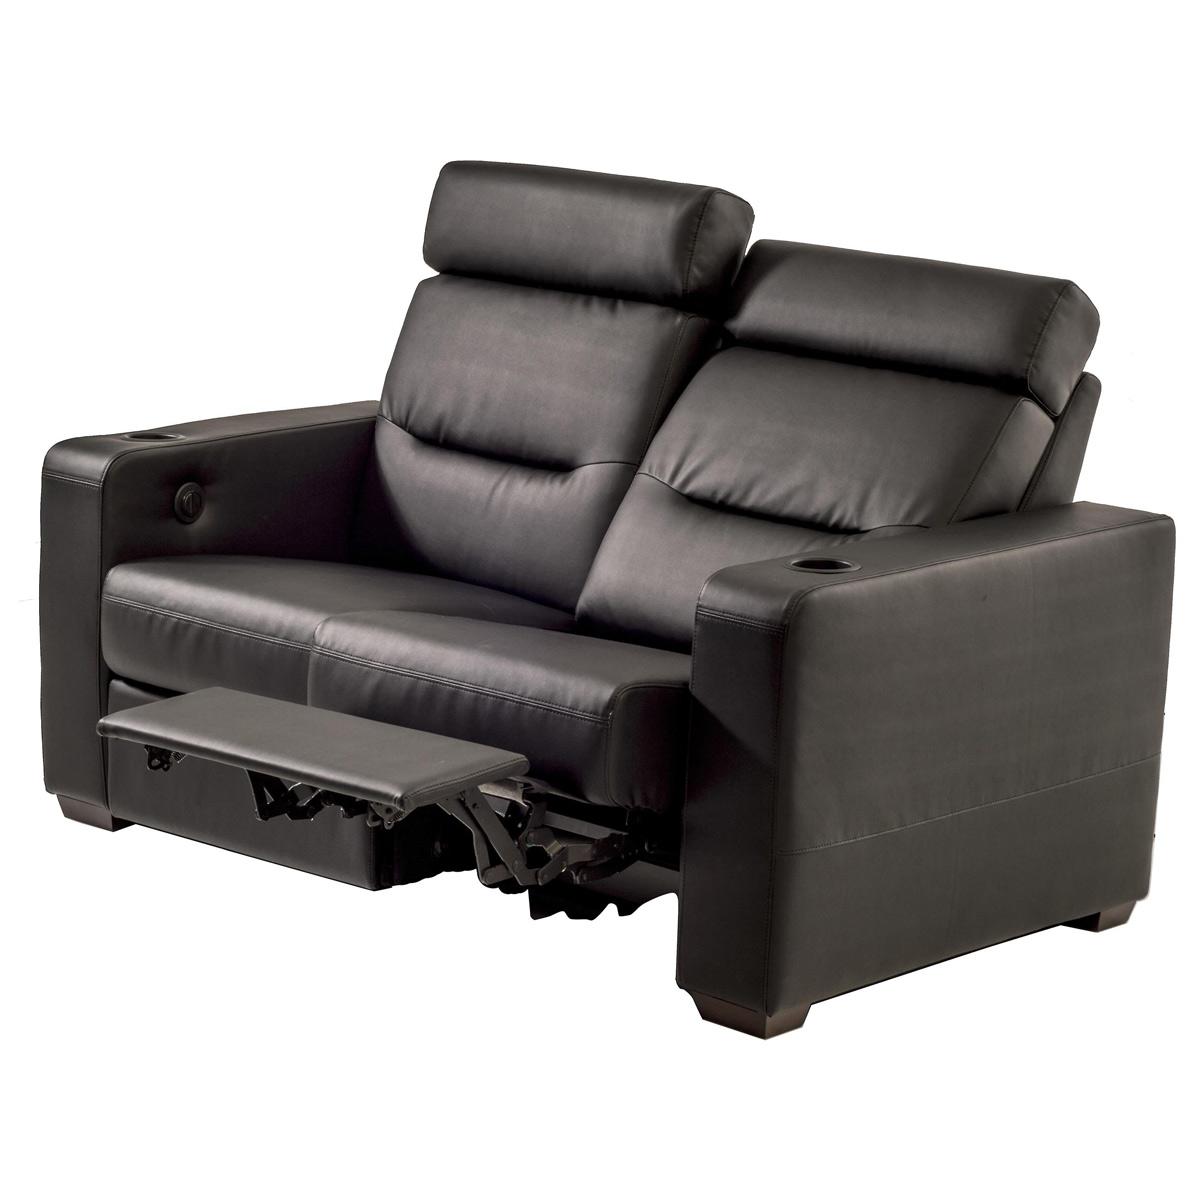 Astounding Details About Salamander Tc3 Av Basics Loveseat Motorized Recliner Home Theater Seating Spiritservingveterans Wood Chair Design Ideas Spiritservingveteransorg